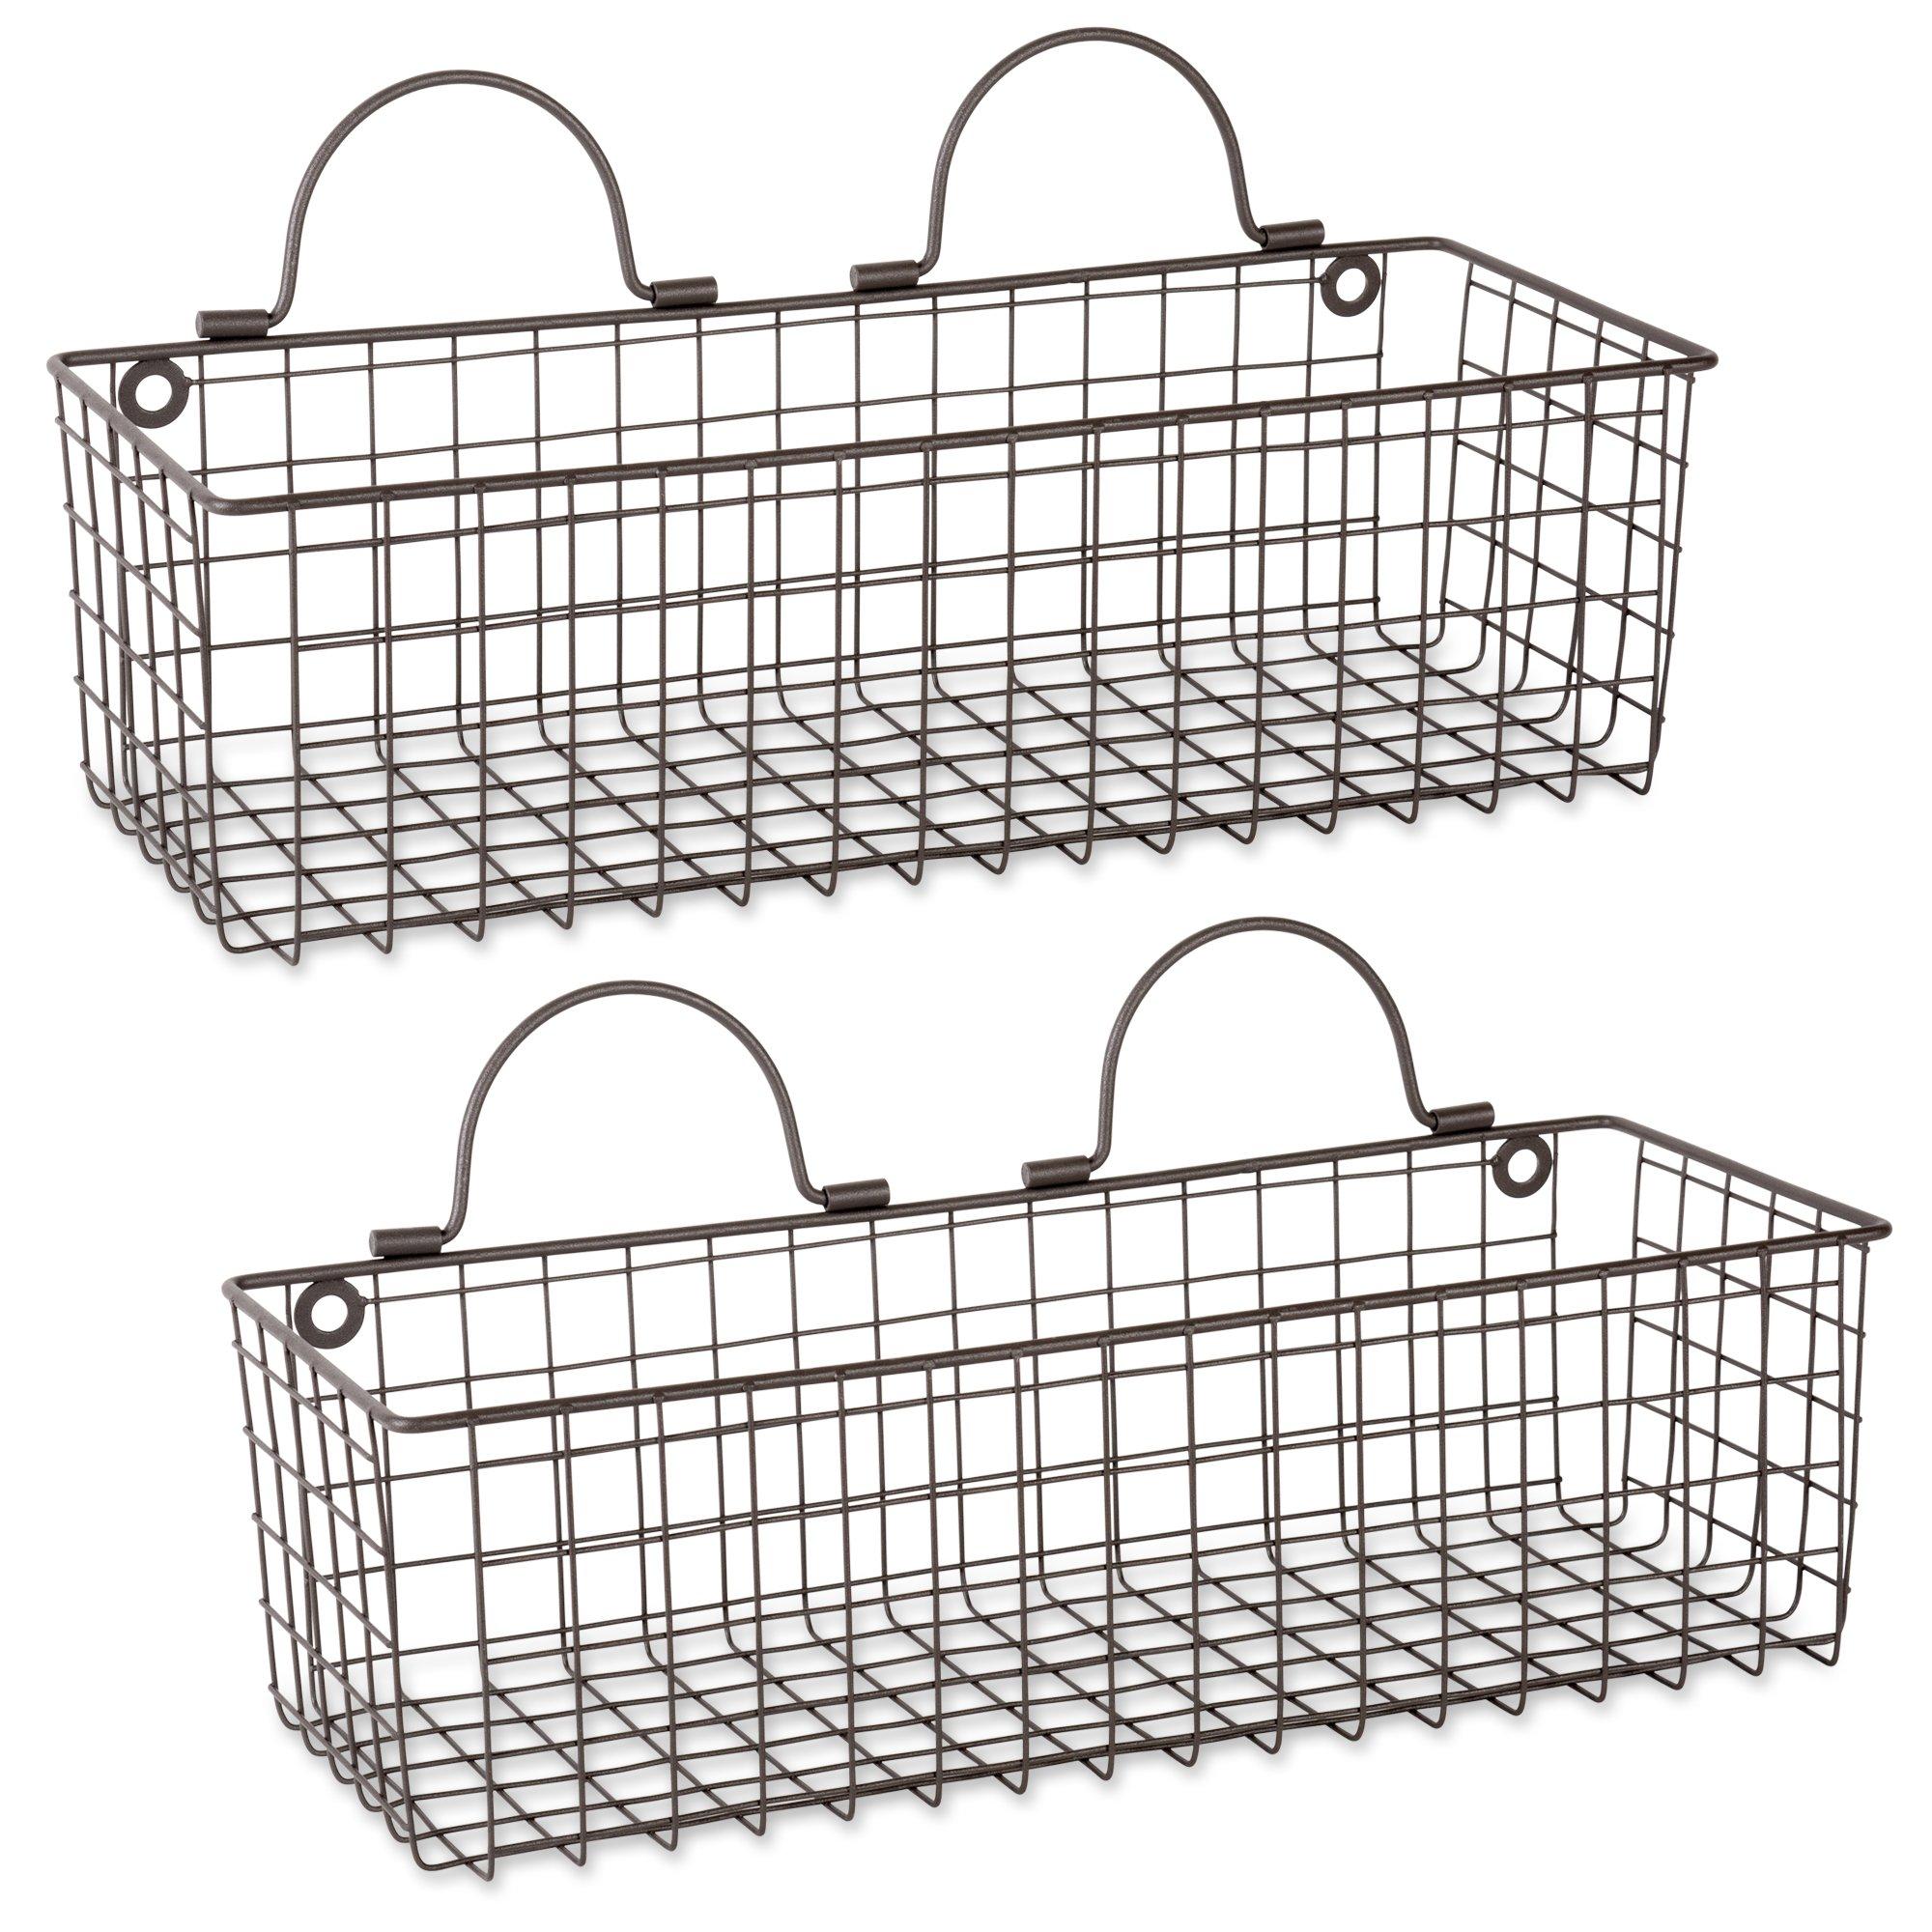 DII Z02020 Rustic Farmhouse Vintage Hanging Wall Mounted Wire Metal Basket, Set of 2 Medium, Bronze